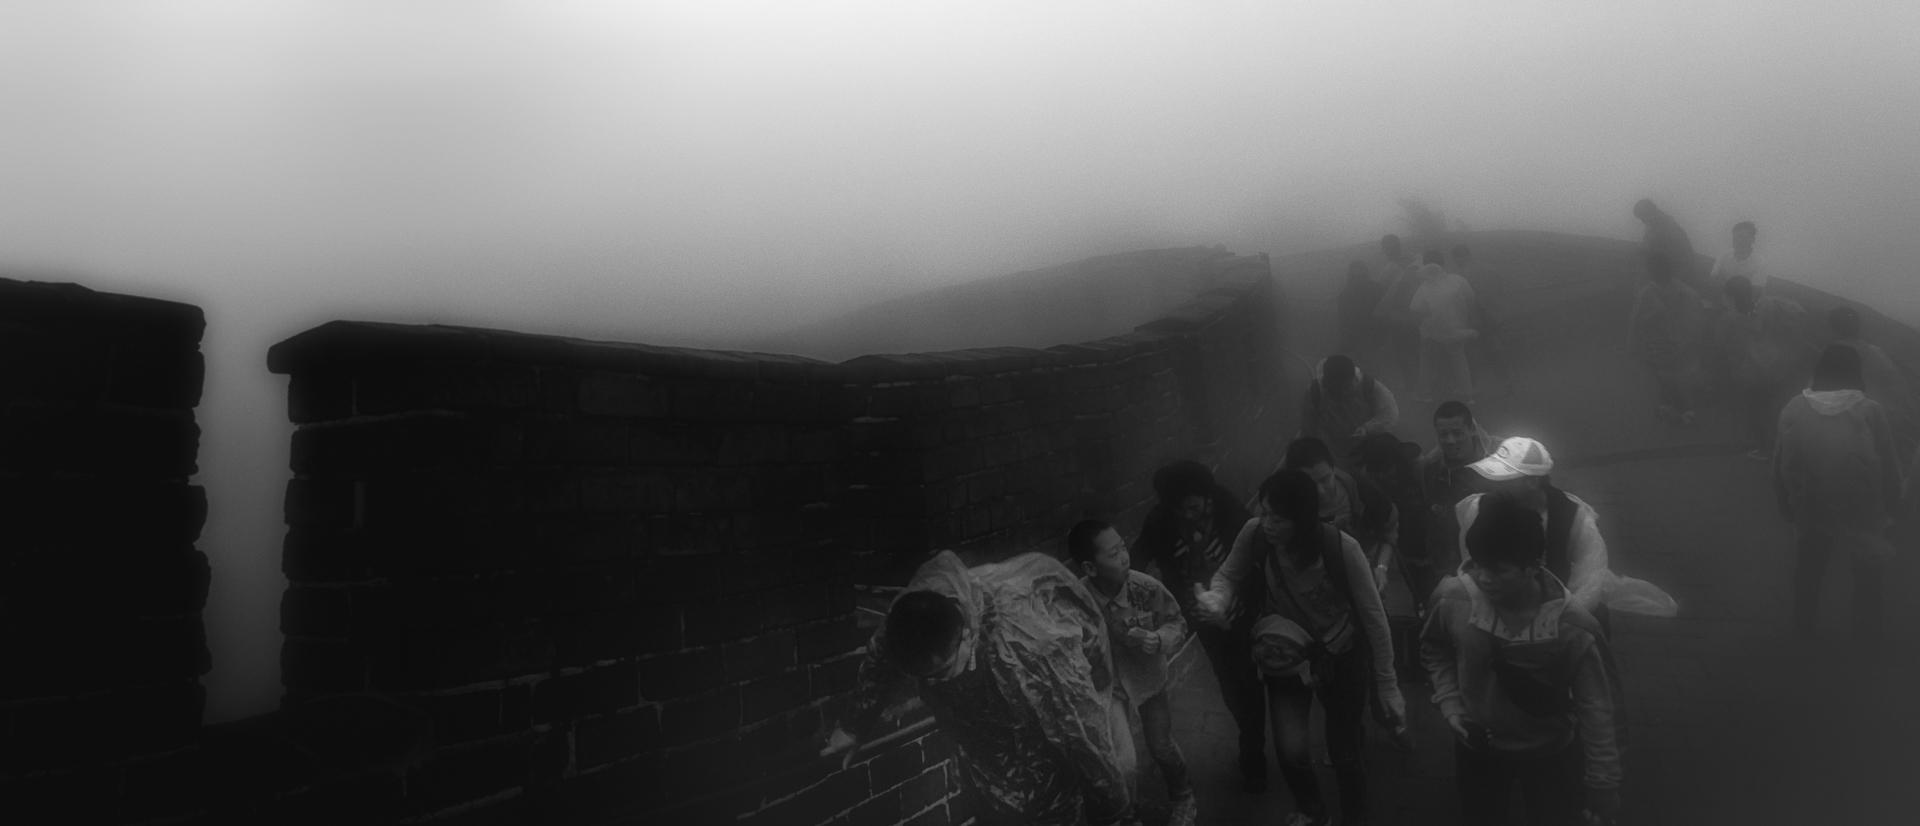 fog.storm.troopers